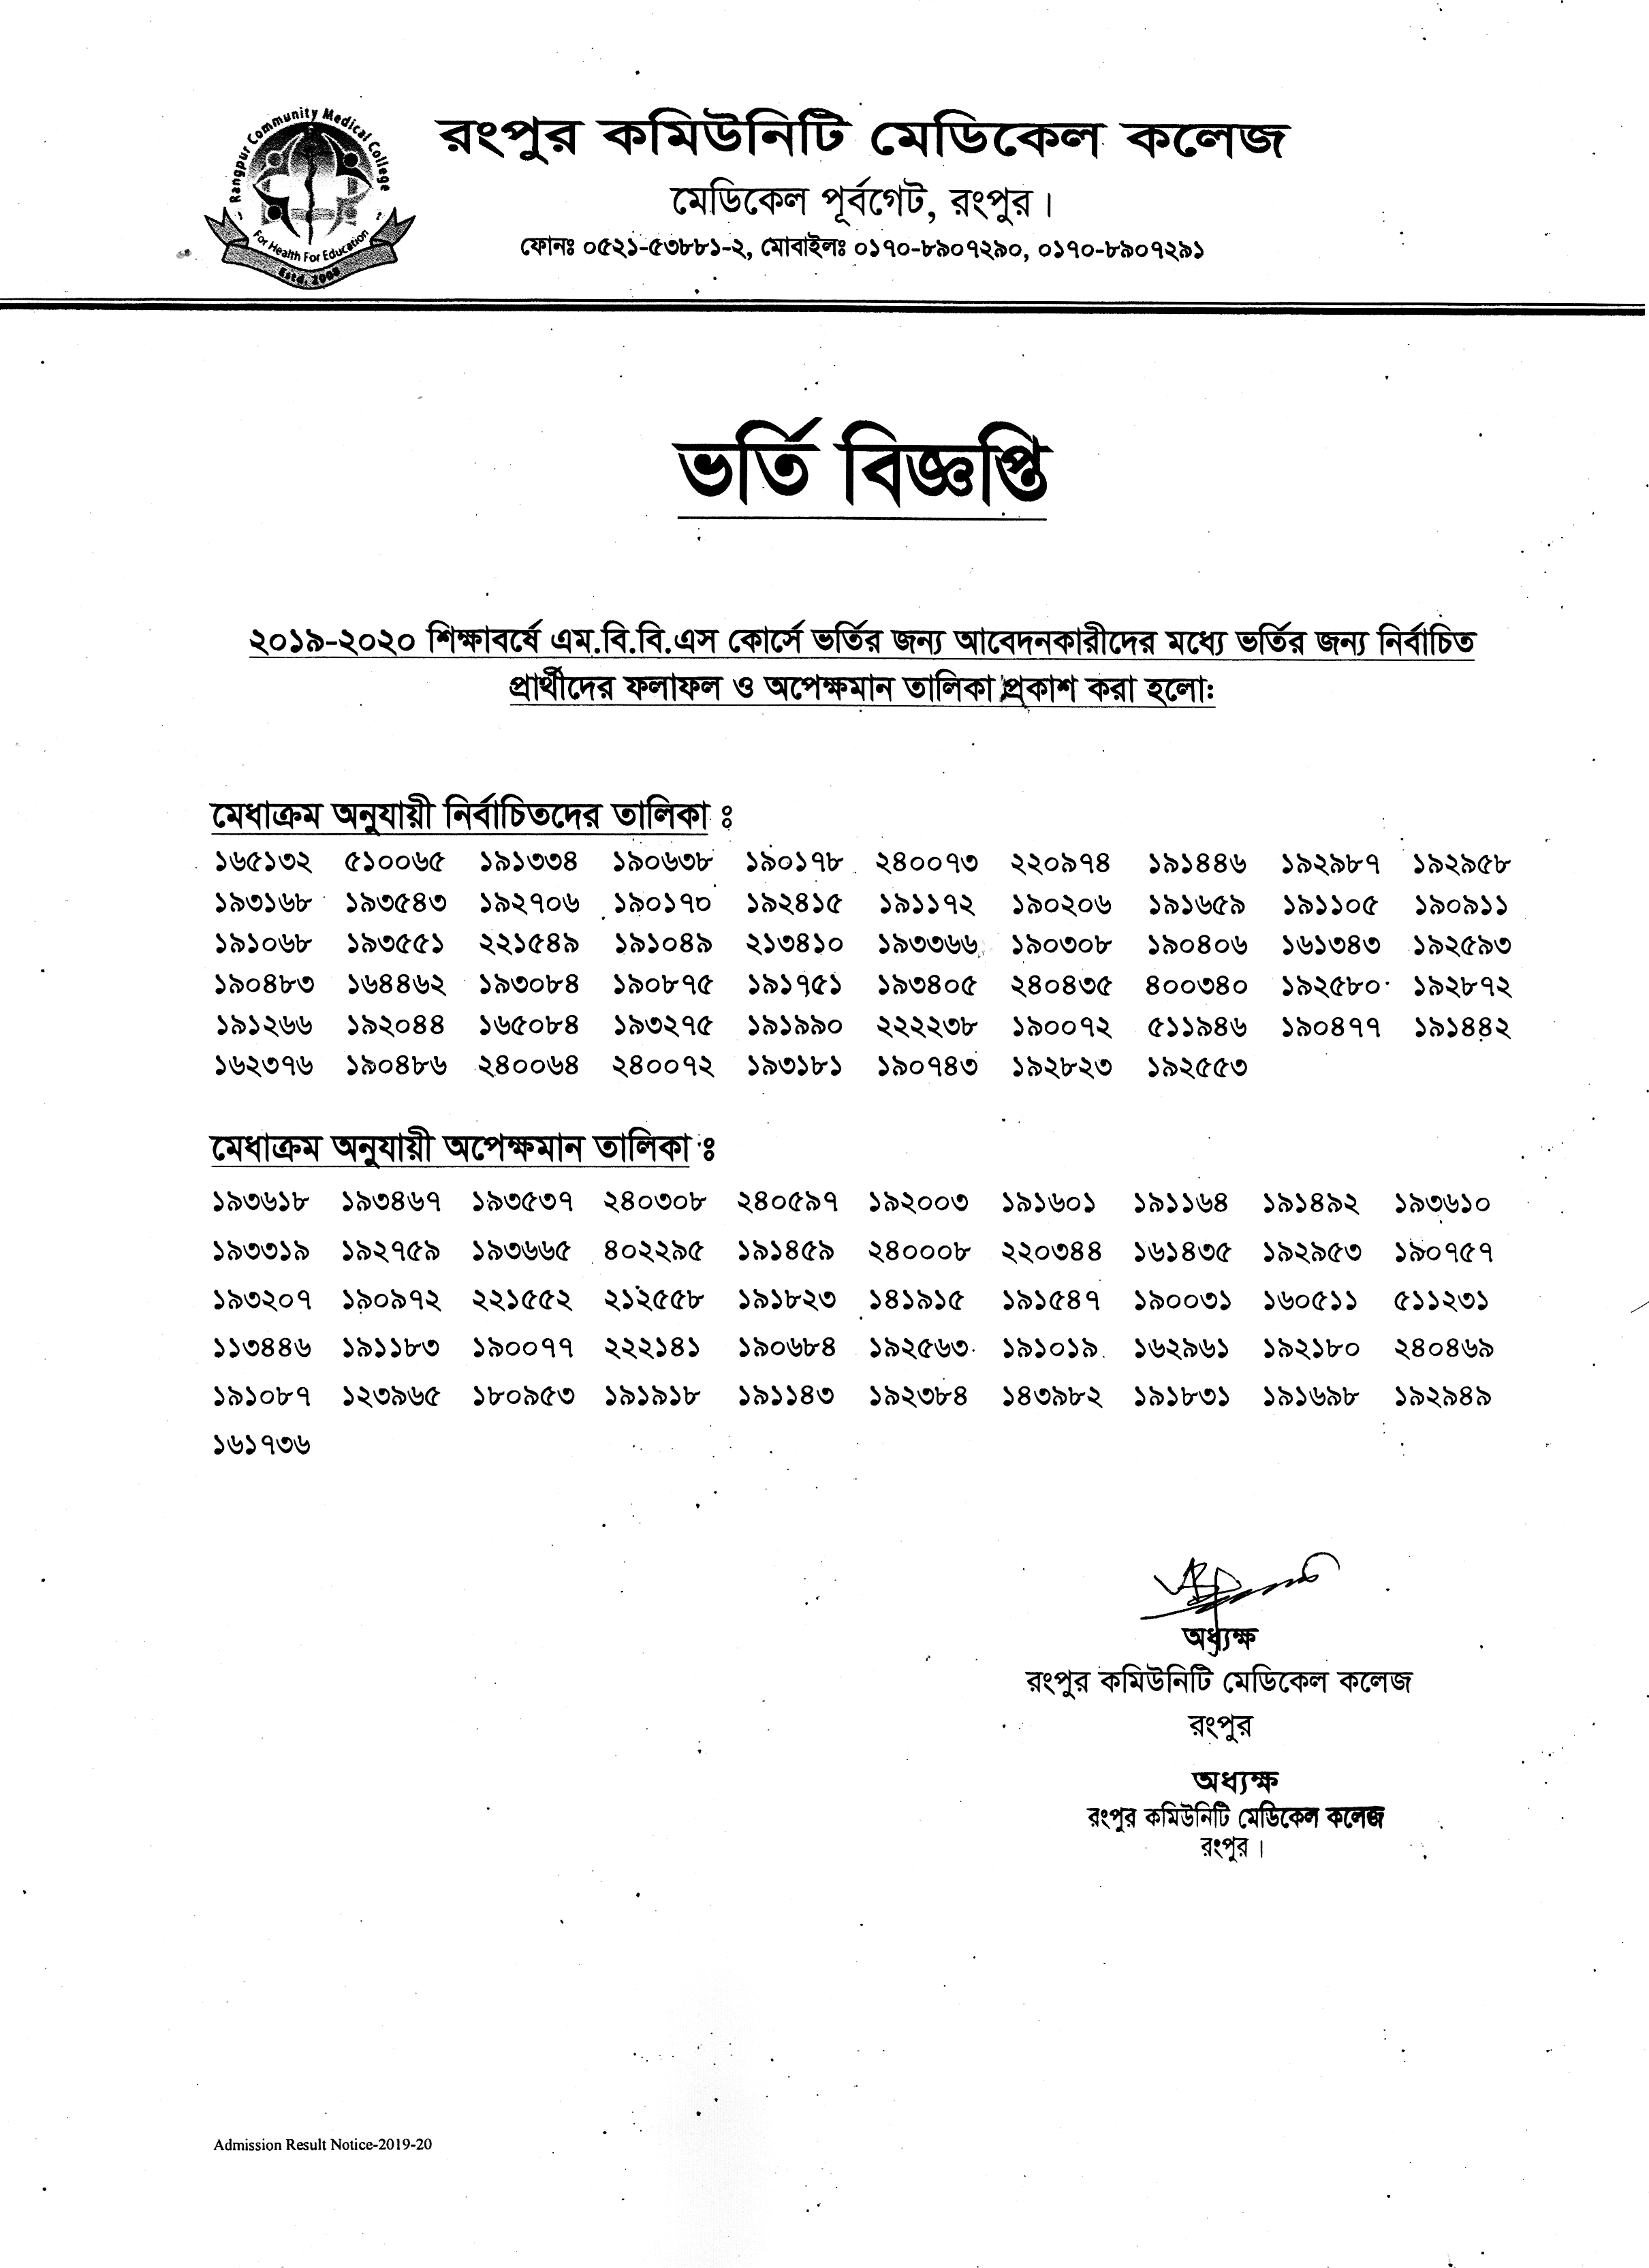 MBBS admission test result of Rangpur Community Medical College (RCMC)